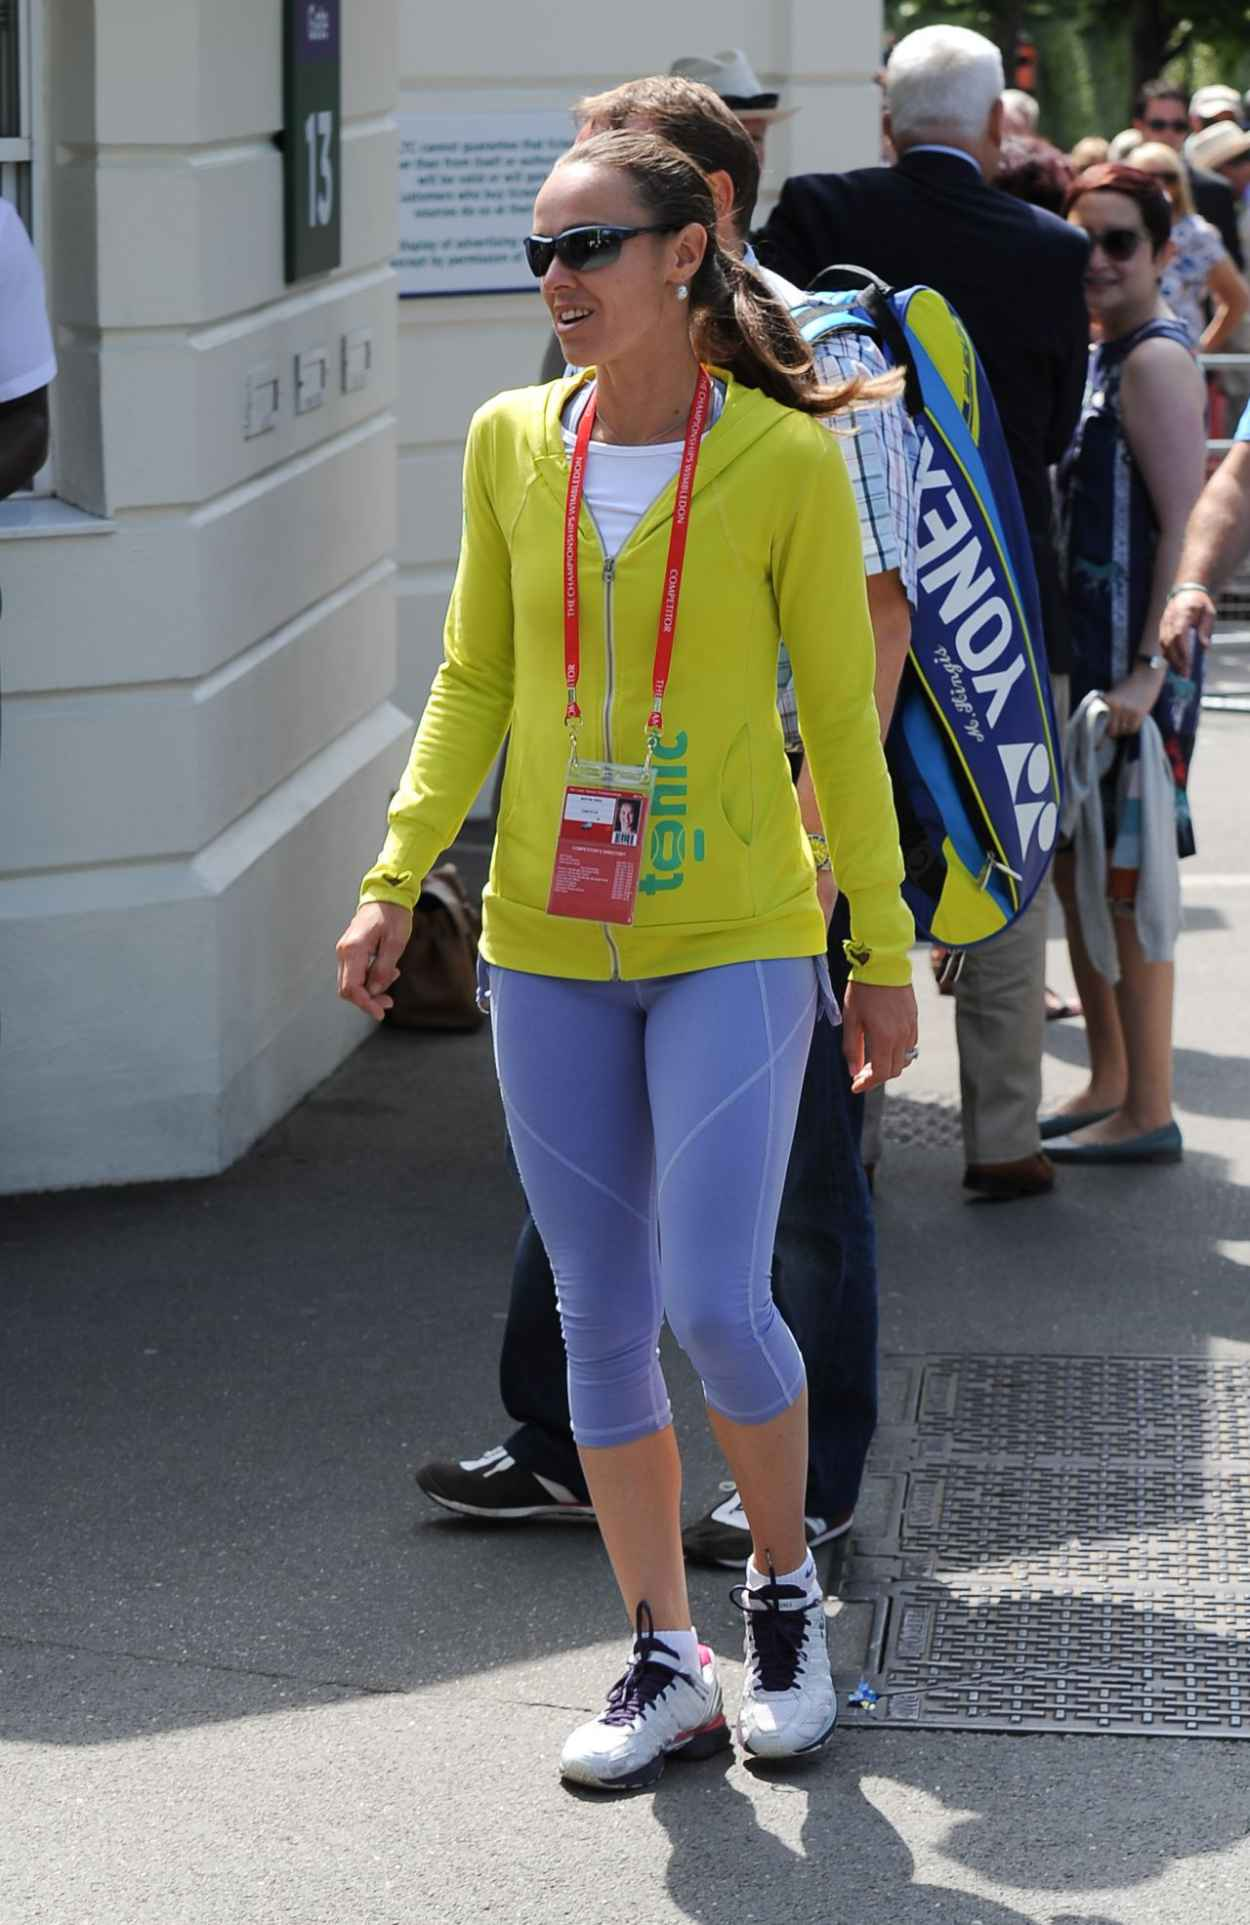 Martina Hingis - Wimbledon Championships 2015 - July 2nd-2